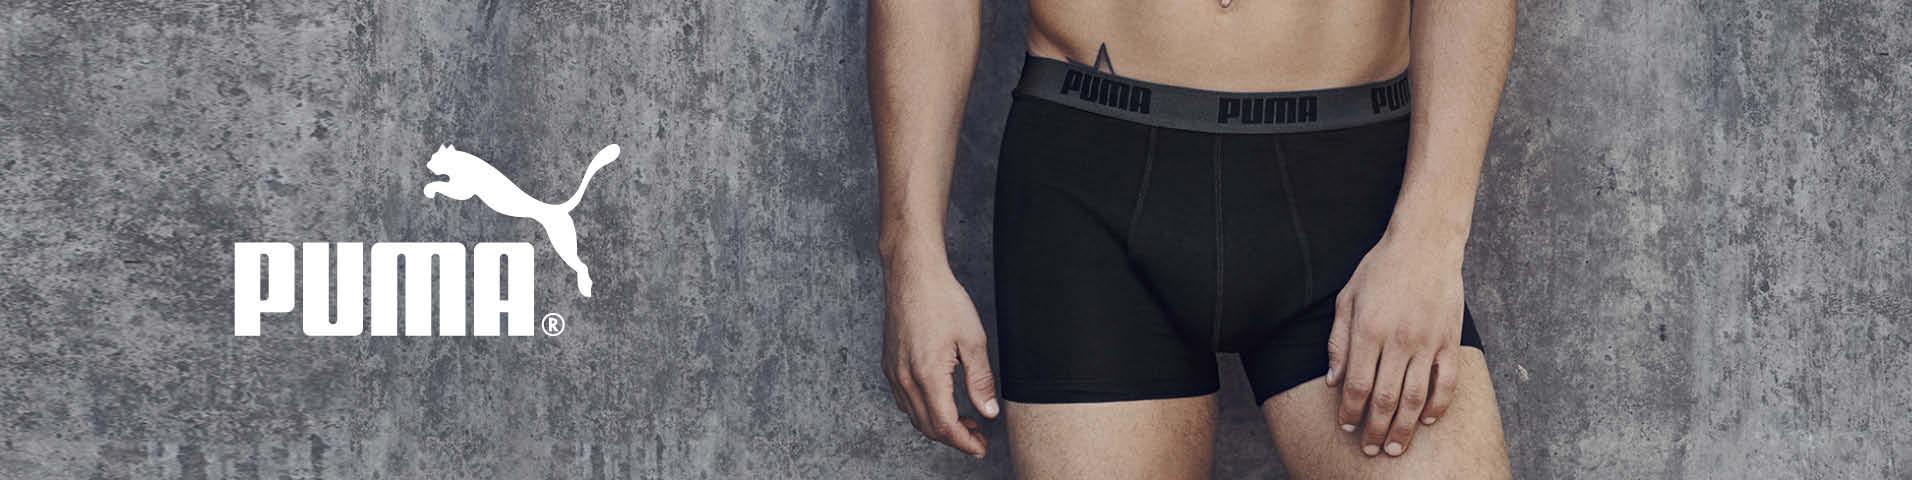 4be410e0a0e Groene Puma Ondergoed voor heren online shop • ZALANDO • Ruim aanbod